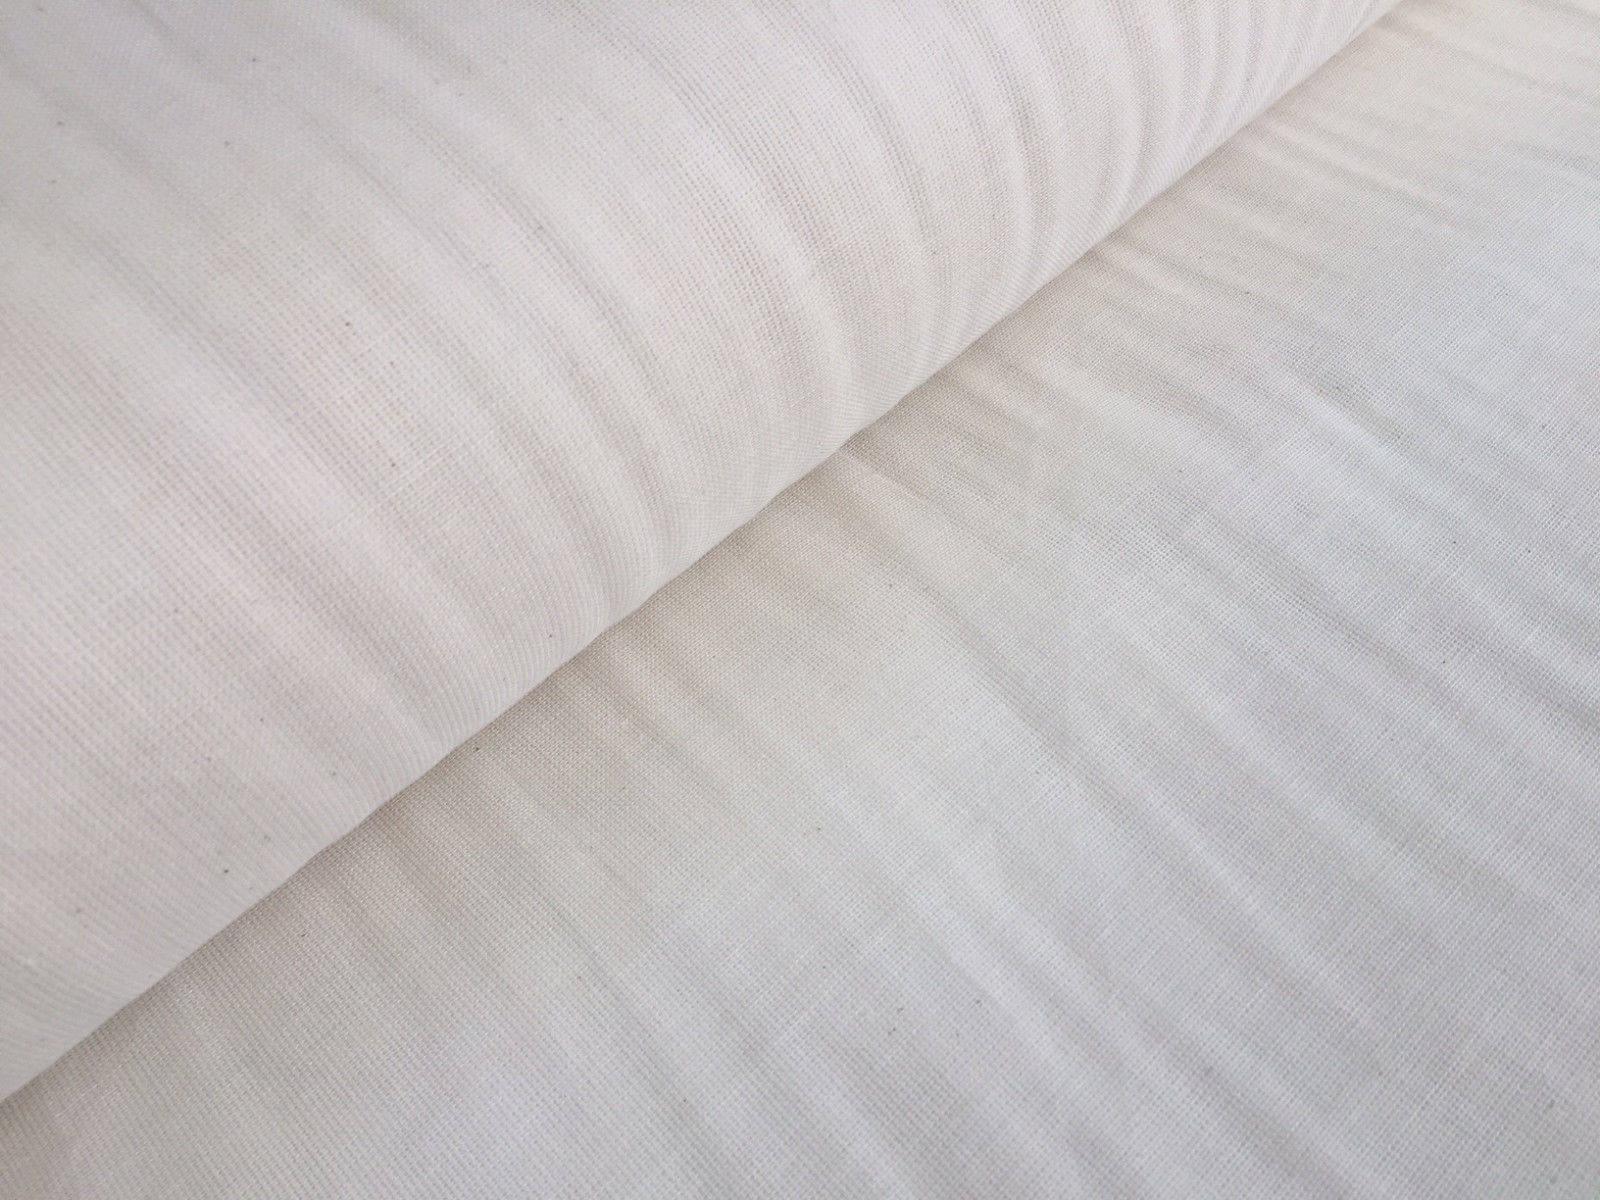 100-cotton-muslin-fabric-voile-curtains-fine-cheese-cloth-160cm-wide-ecru-594bf8f33.jpg